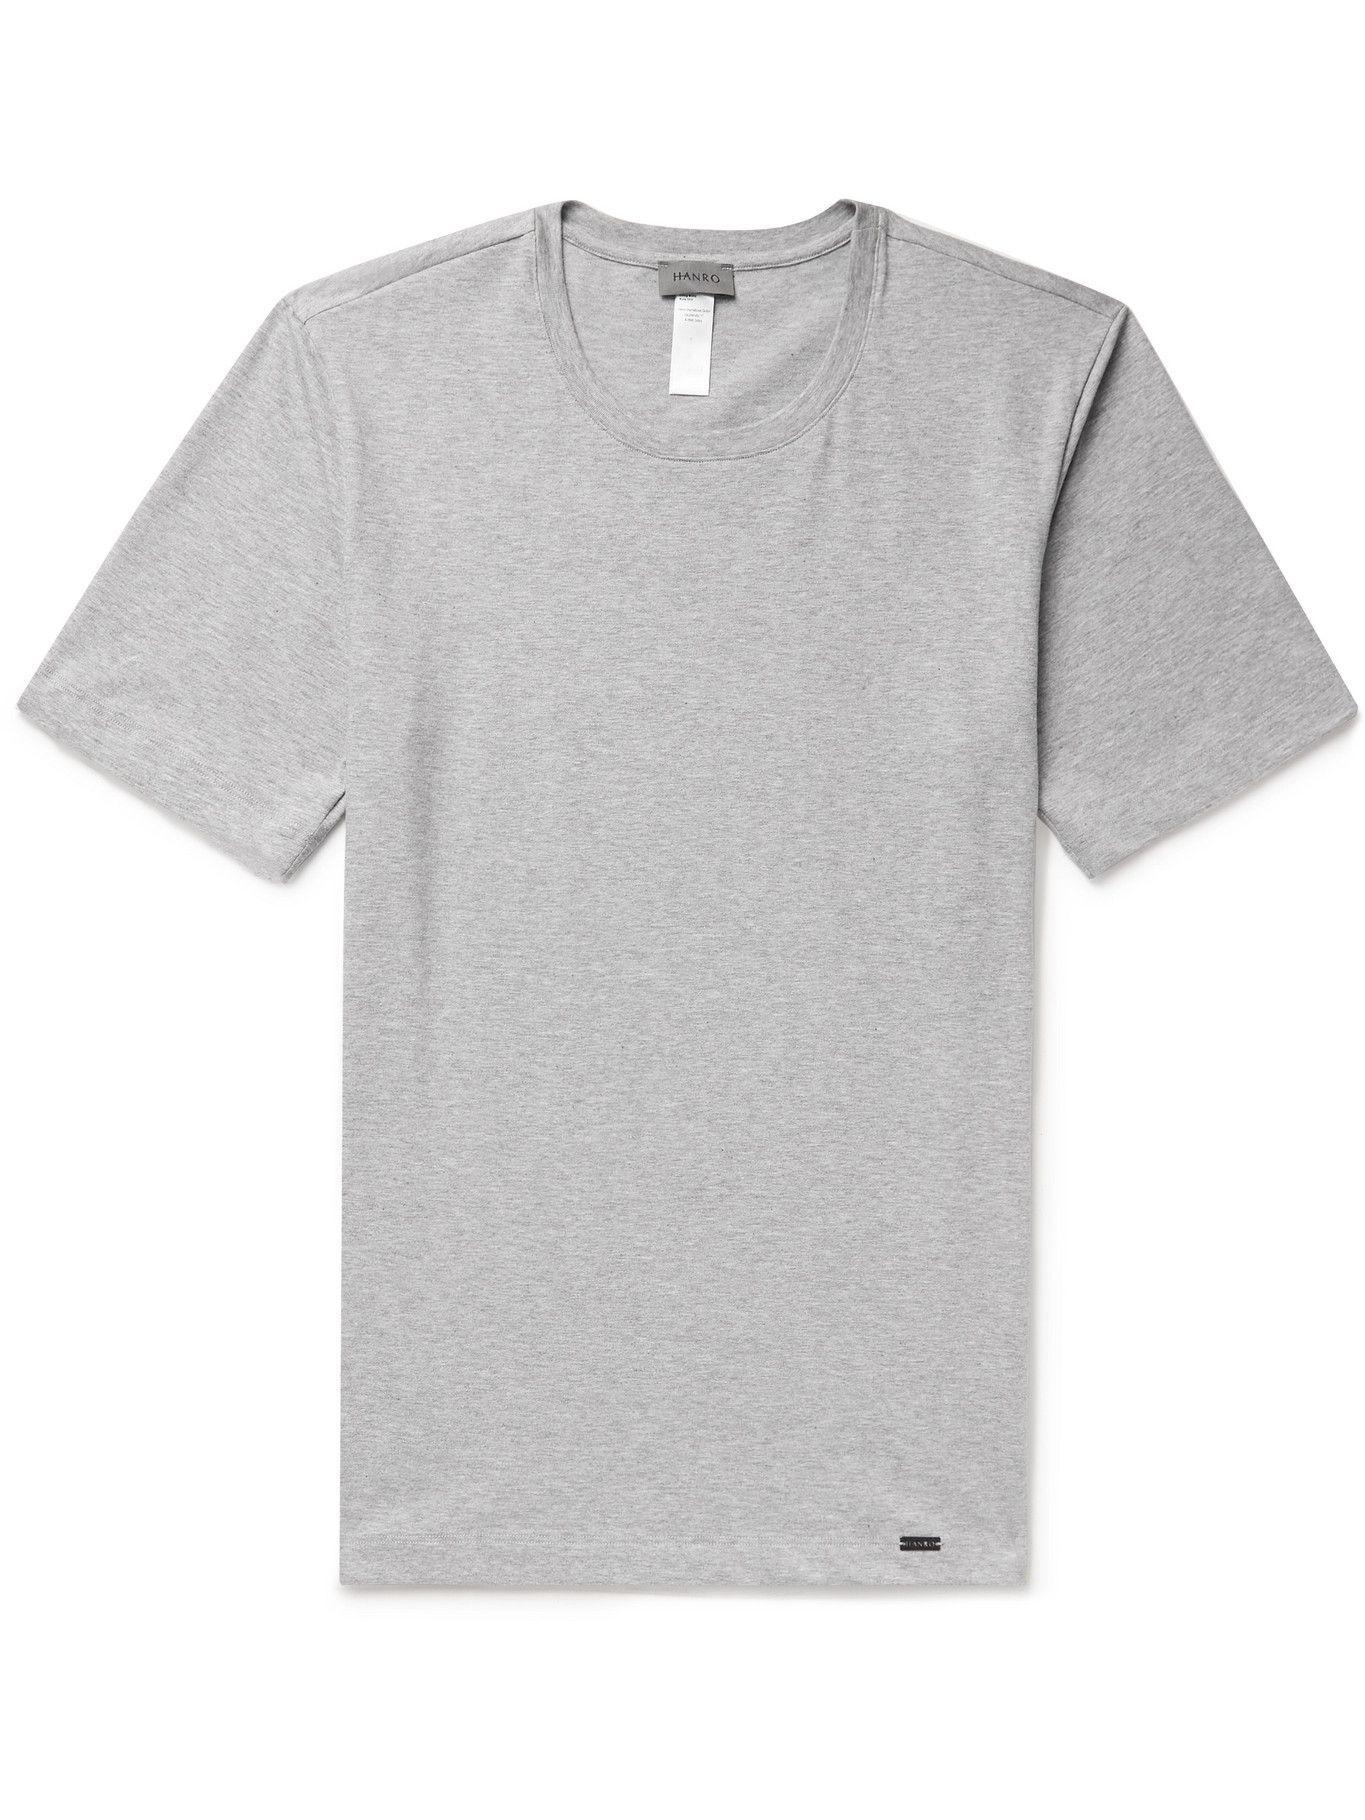 Hanro - Living Cotton-Jersey T-Shirt - Gray